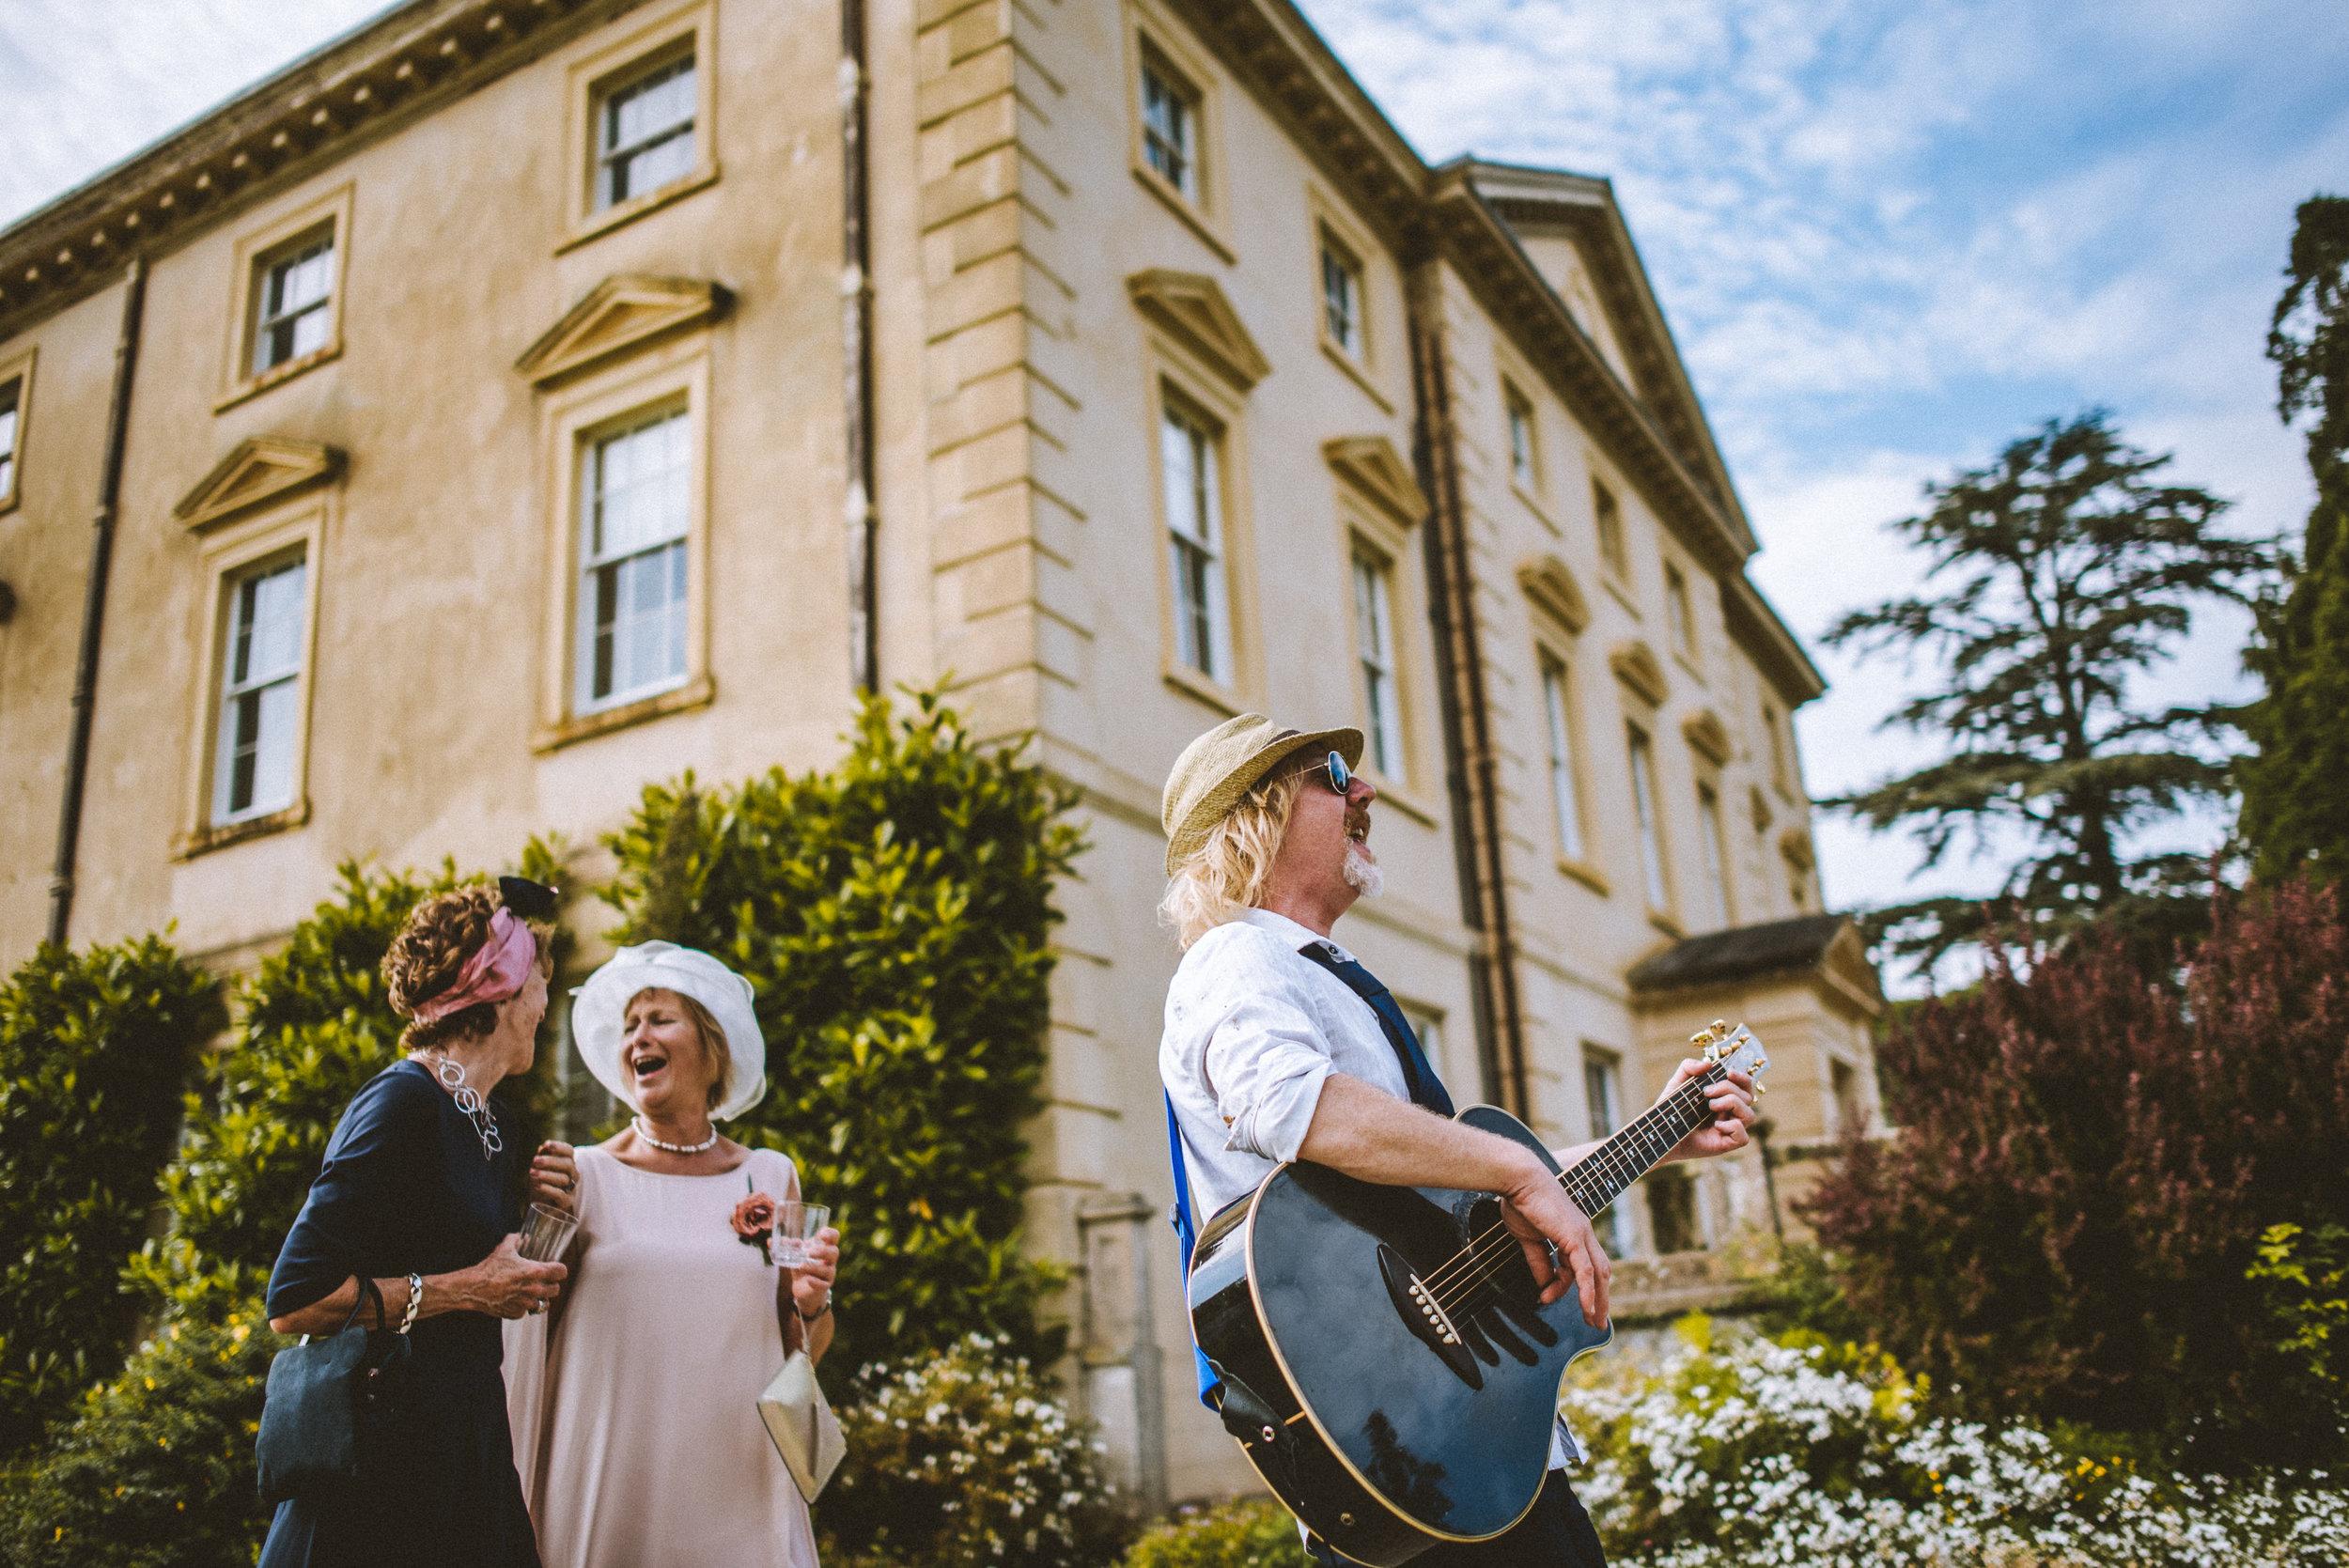 pencarrow-house-wedding-photographer-100.jpg